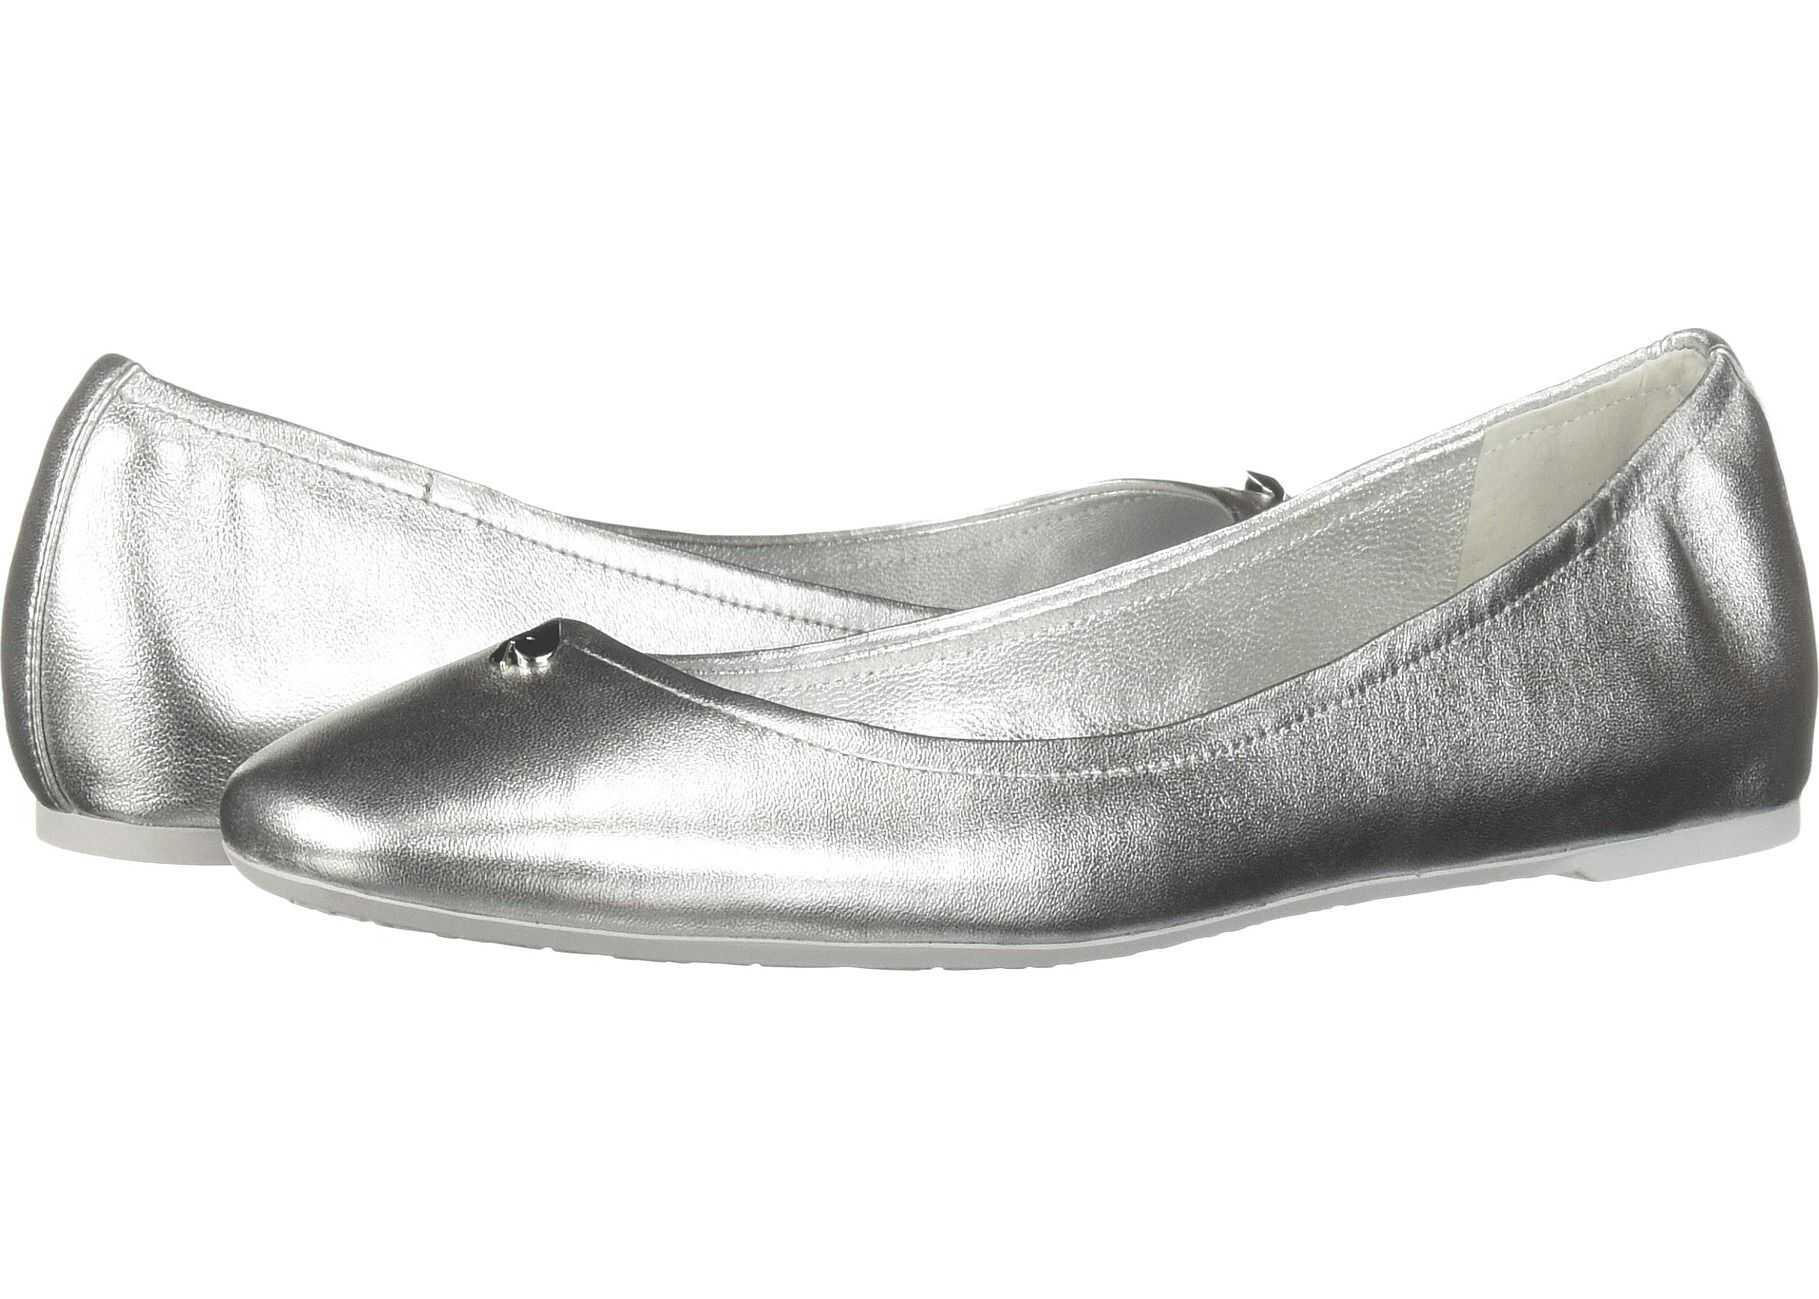 Kate Spade New York Kora Silver Metallic Nappa